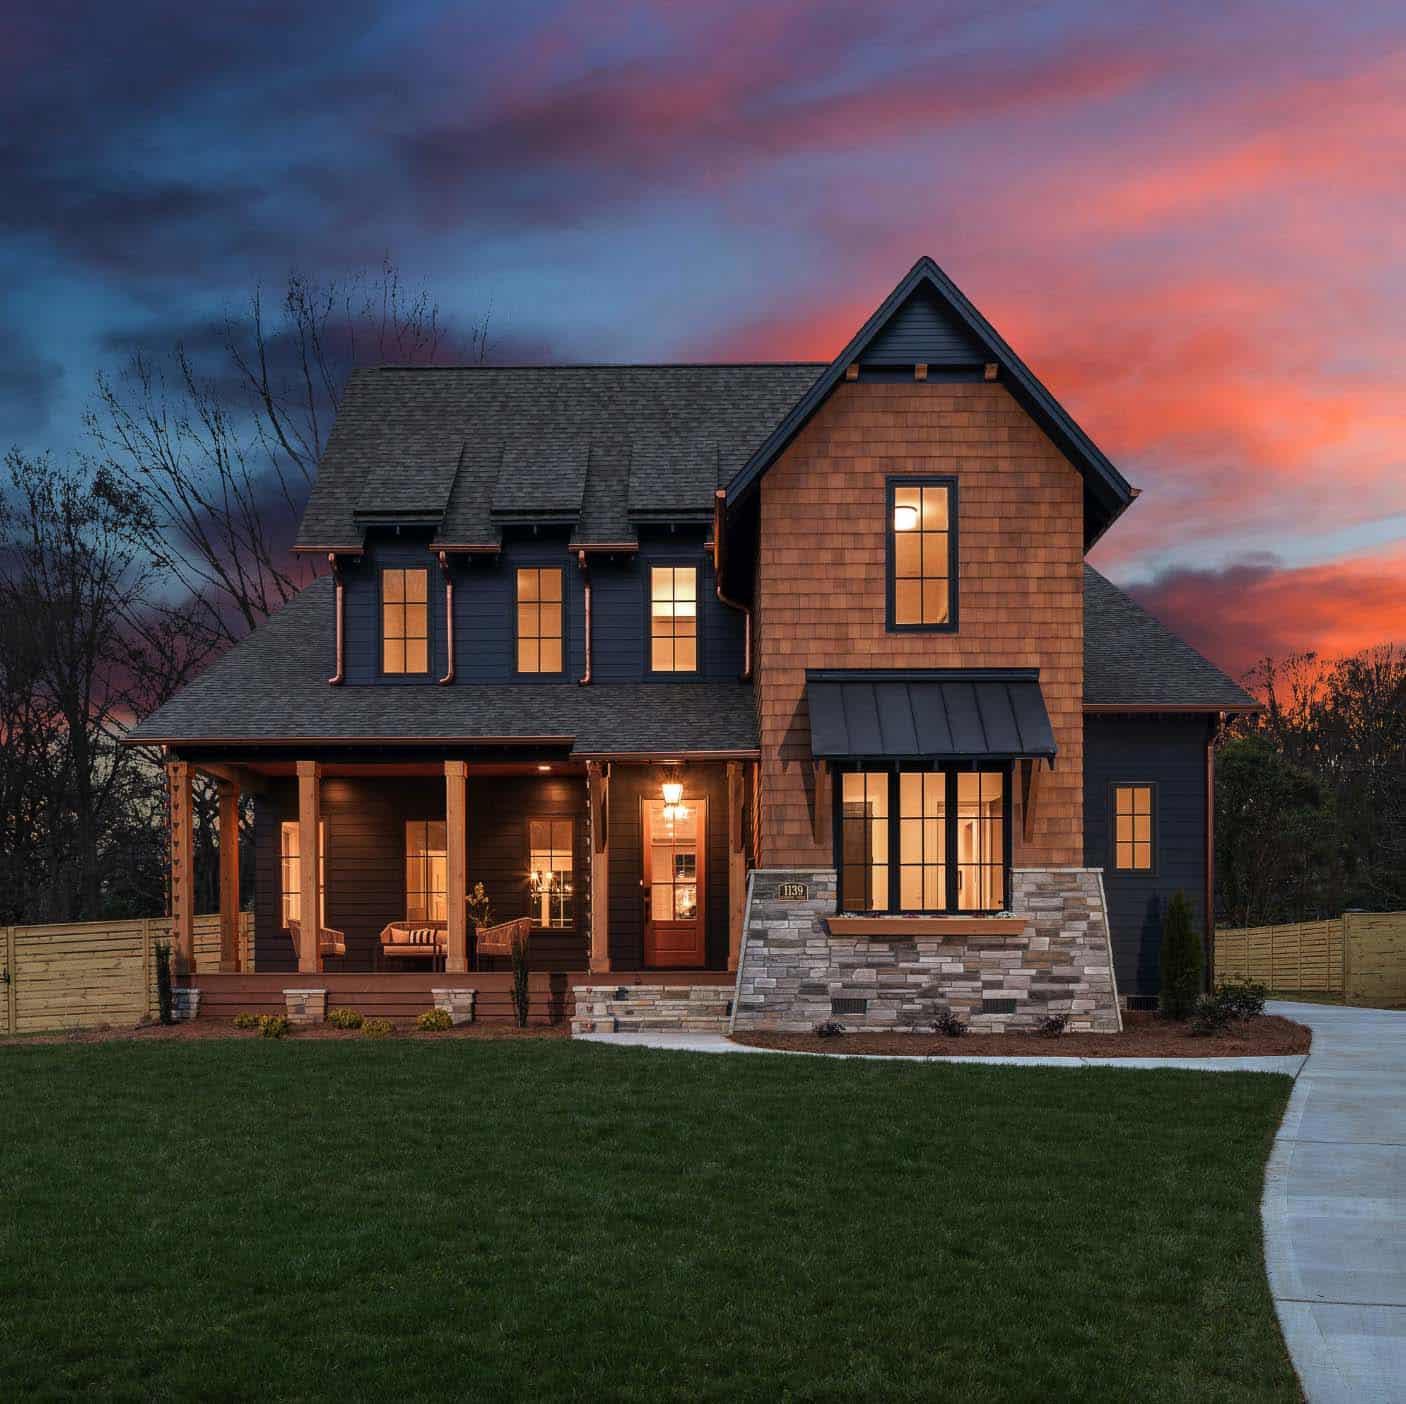 farmhouse-front-exterior-dusk